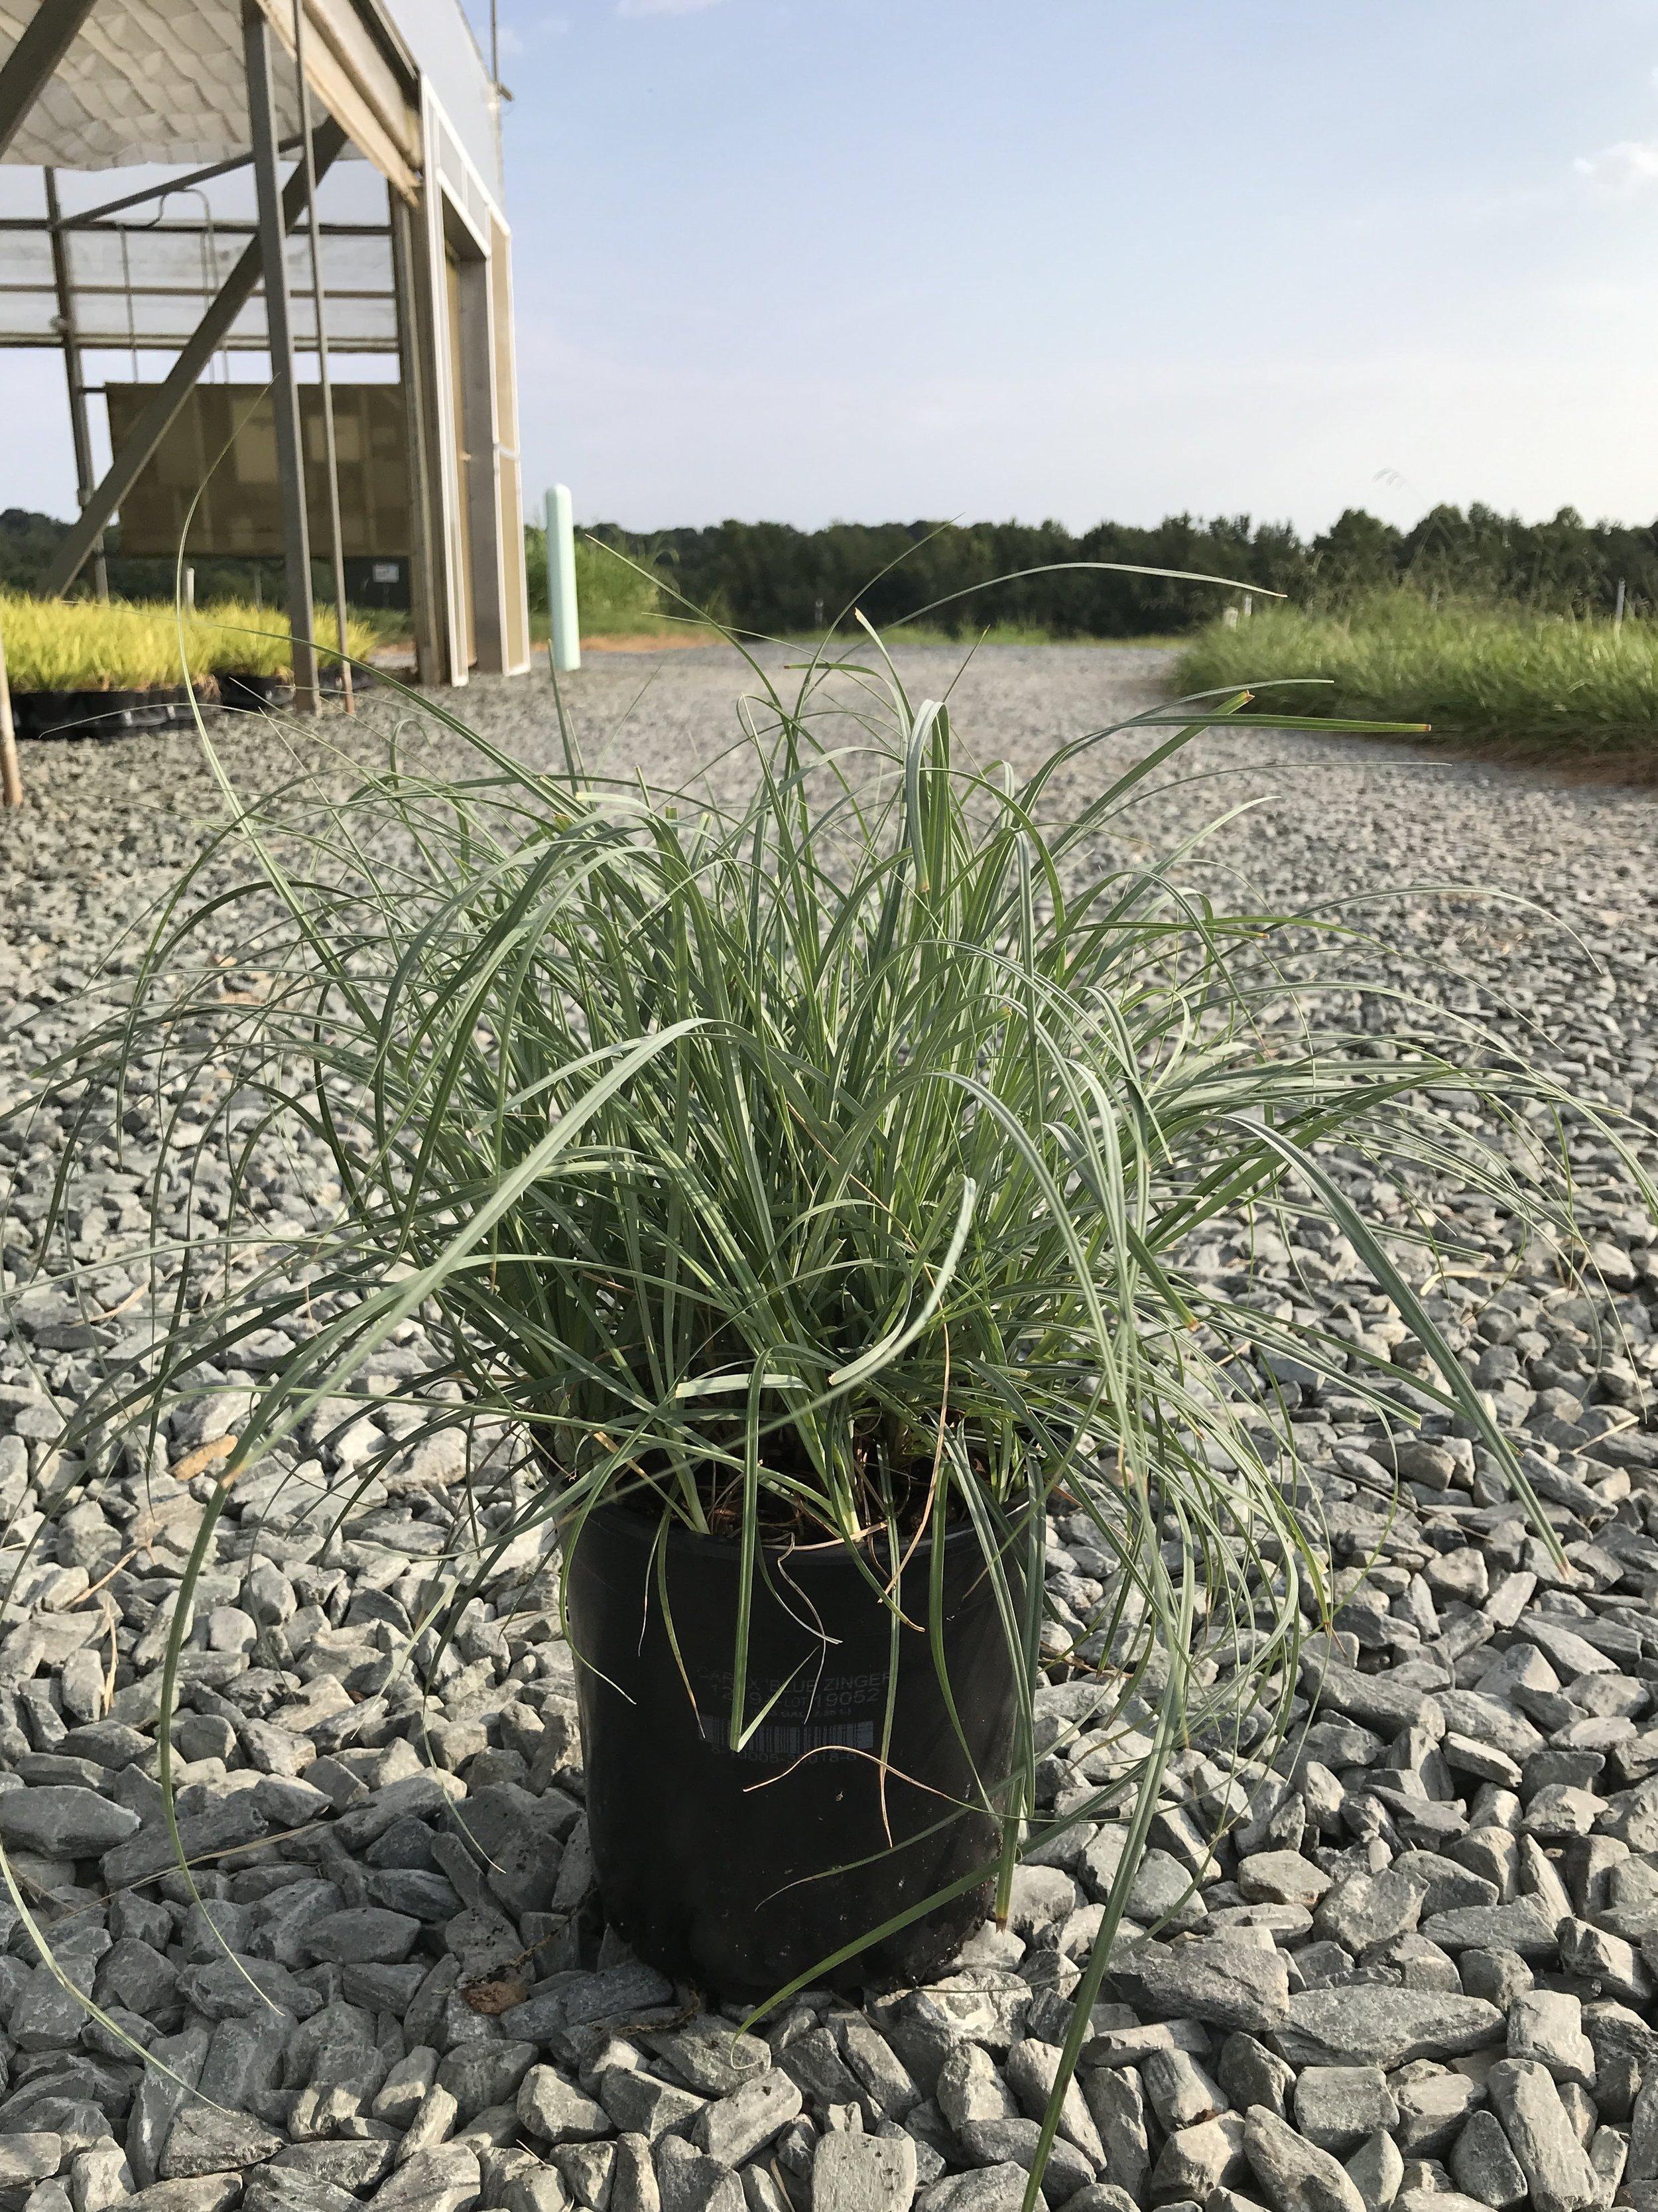 Carex flacca 'Blue Zinger' 1 gallon